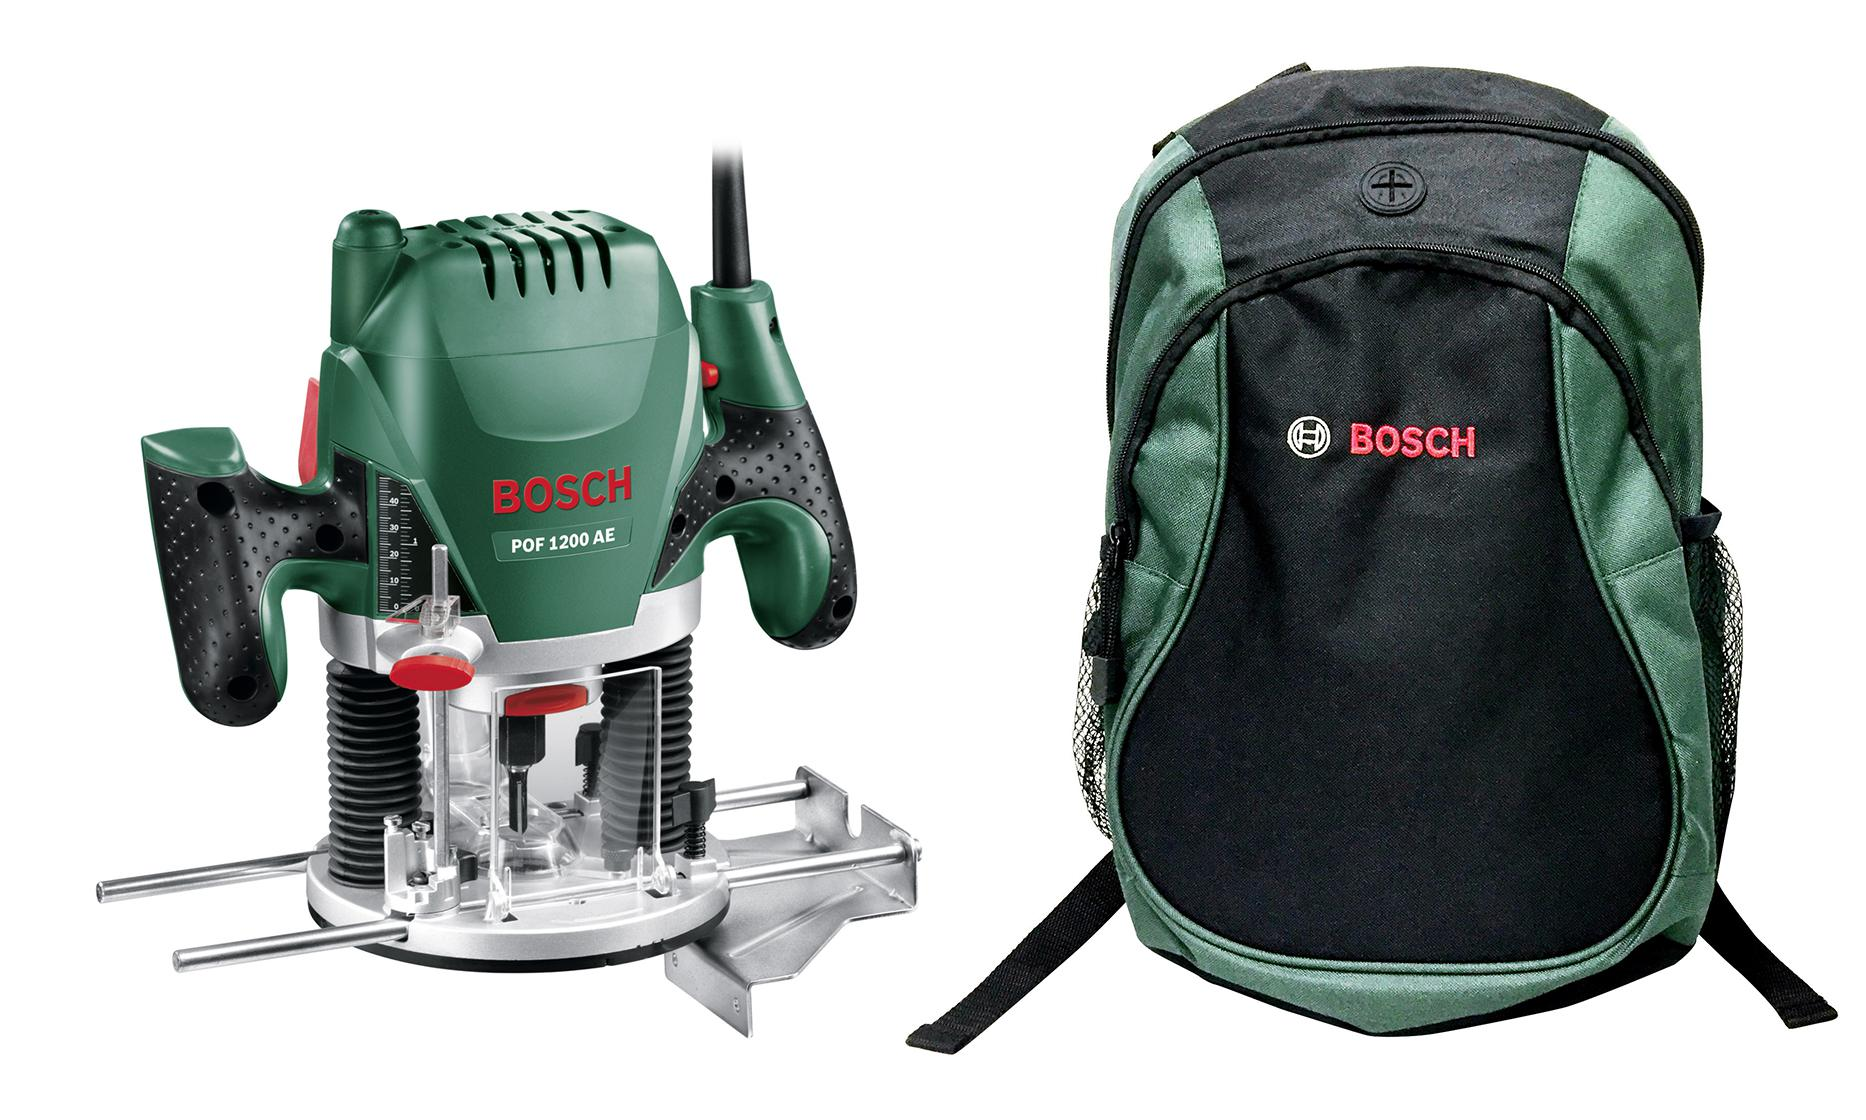 Набор Bosch Фрезер pof 1200 ae (0.603.26a.100) +Рюкзак green (1619g45200) фрезер bosch pof 1200 ae 060326a100